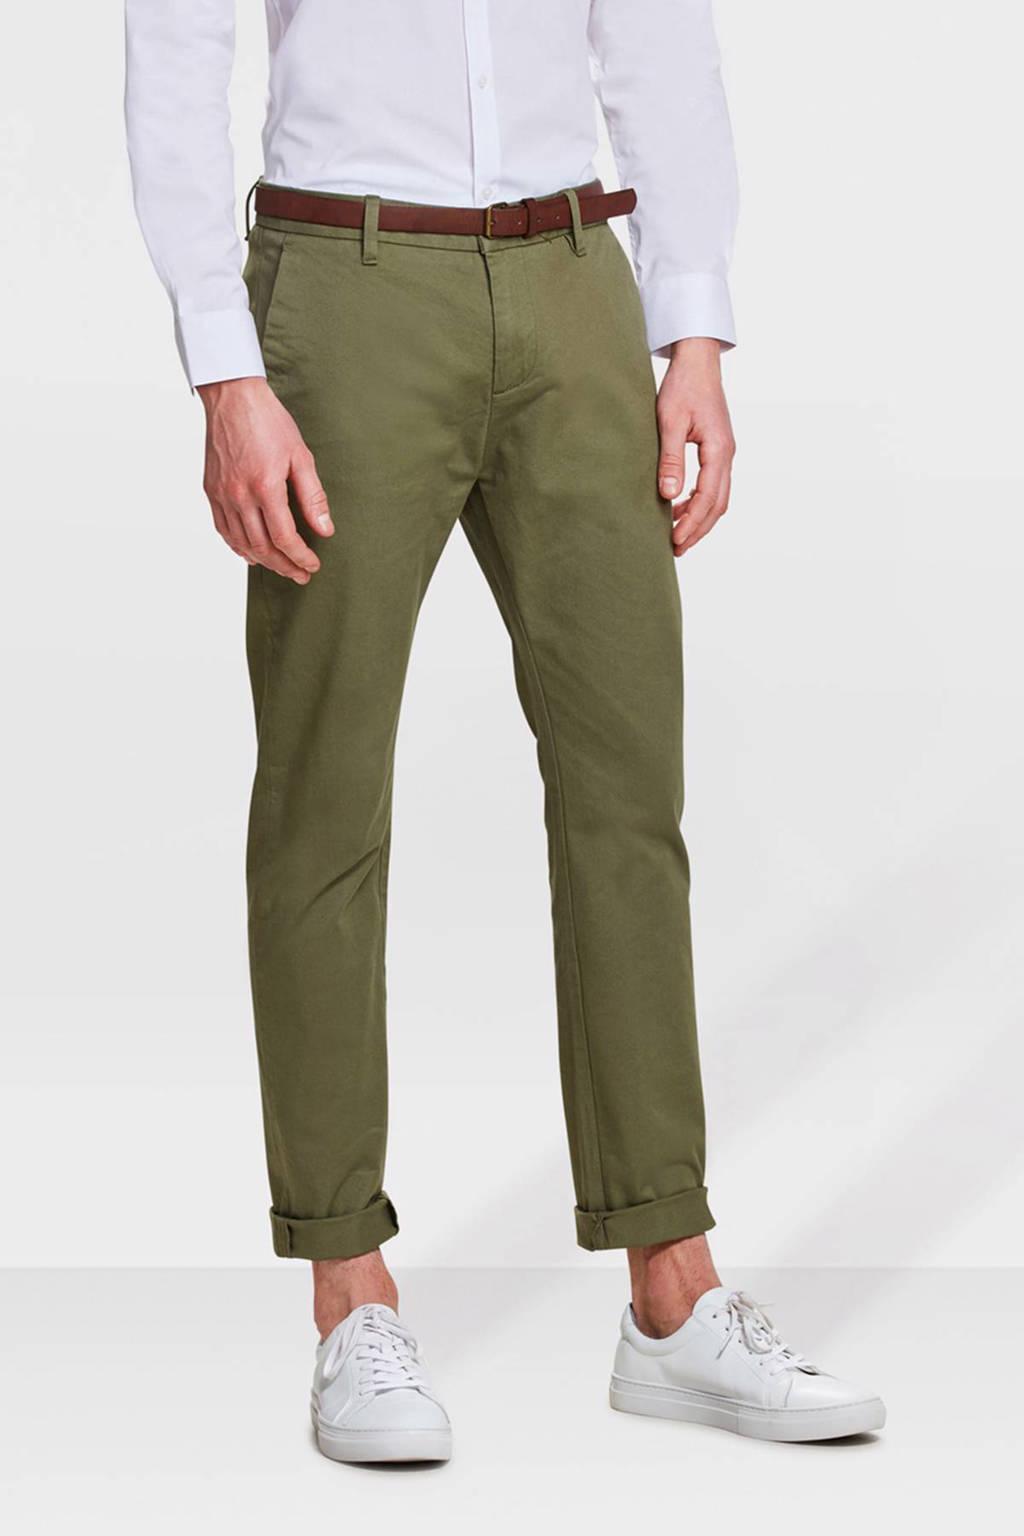 WE Fashion Blue Ridge Bobby skinny fit chino olijfgroen, Olijfgroen